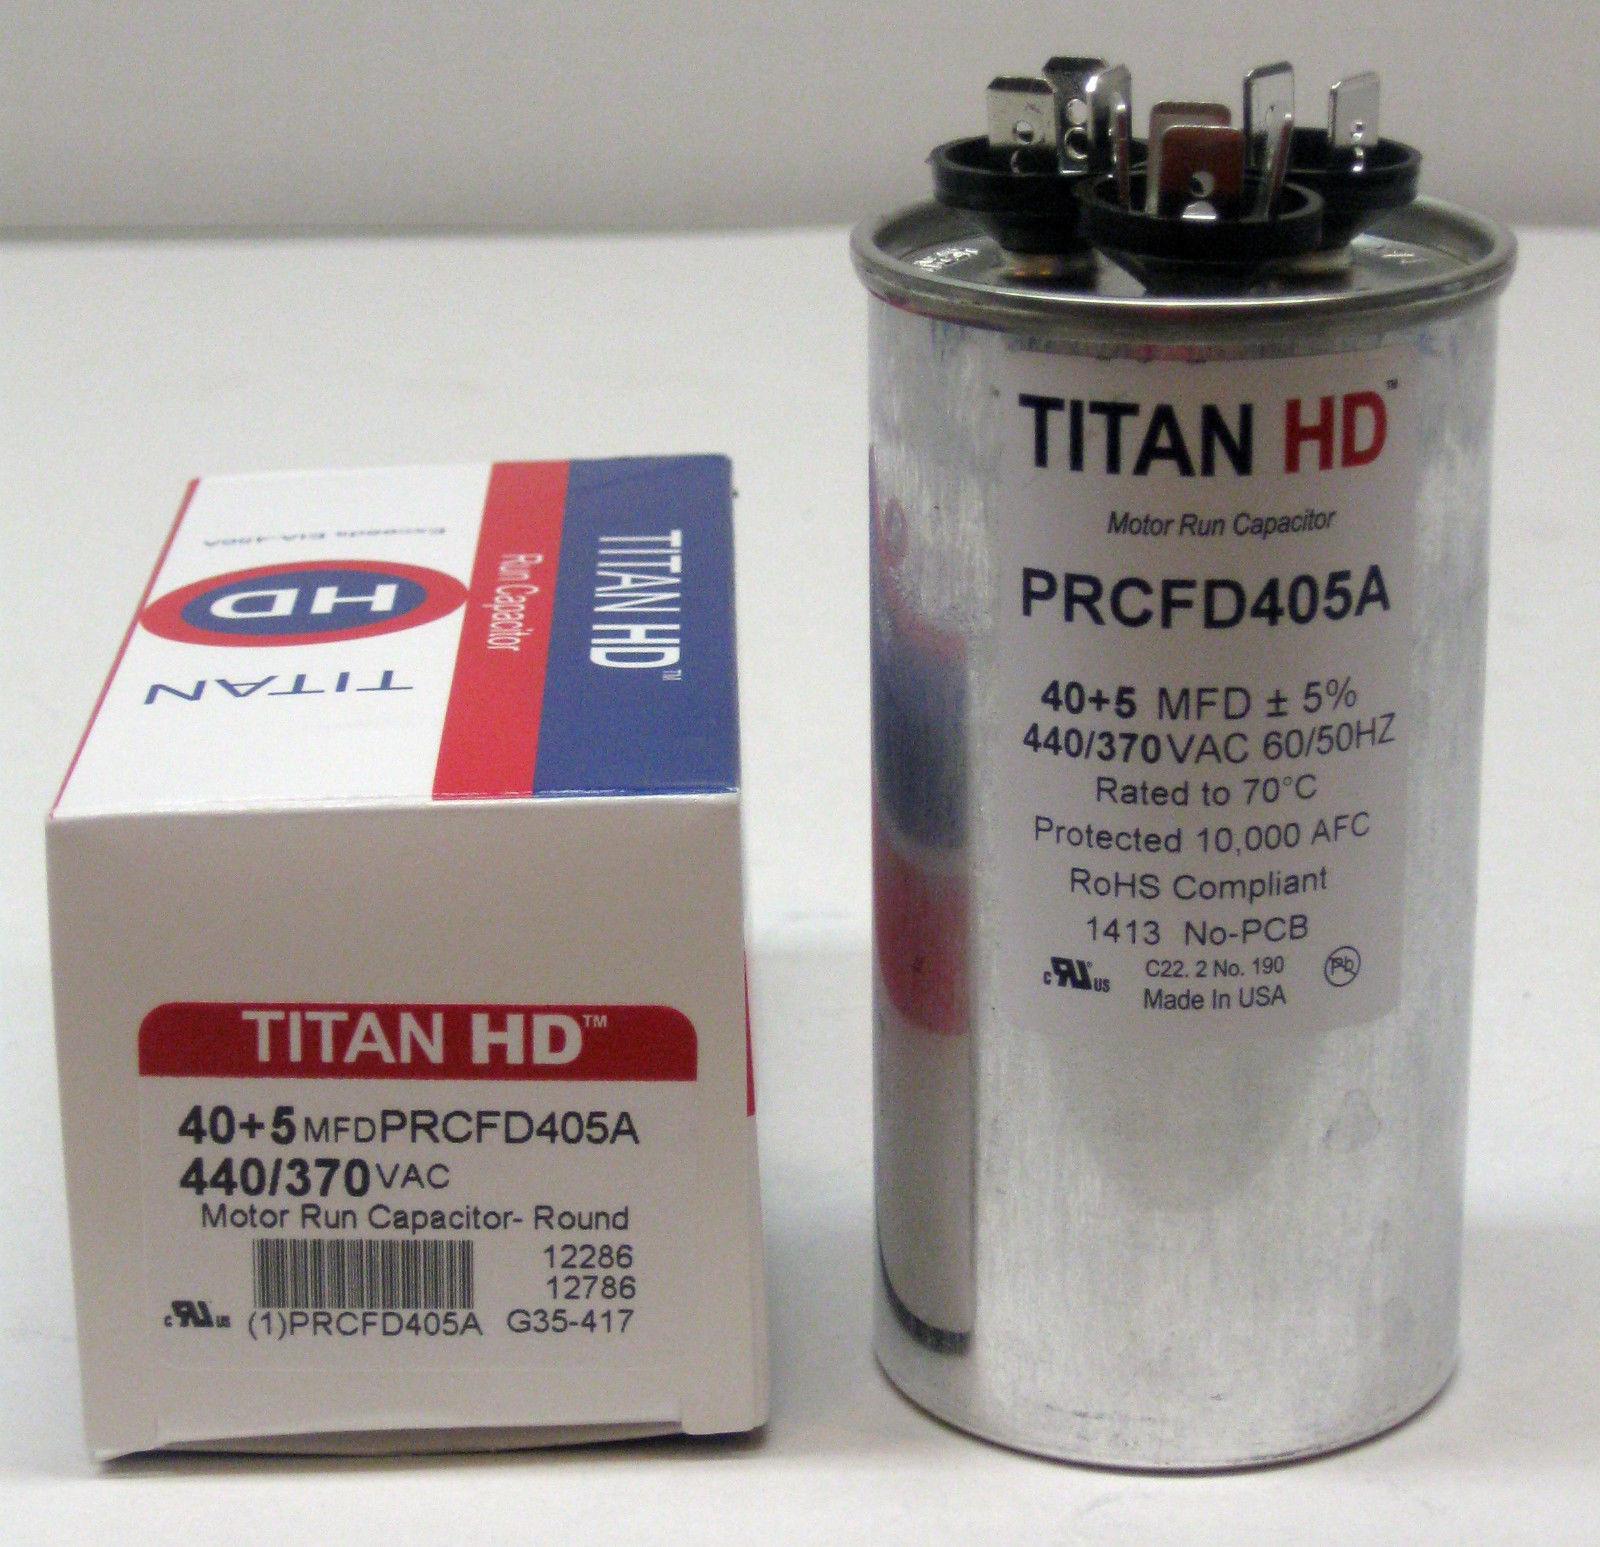 Titanhd Prcfd405a American Made Round Run Dual Capacitor